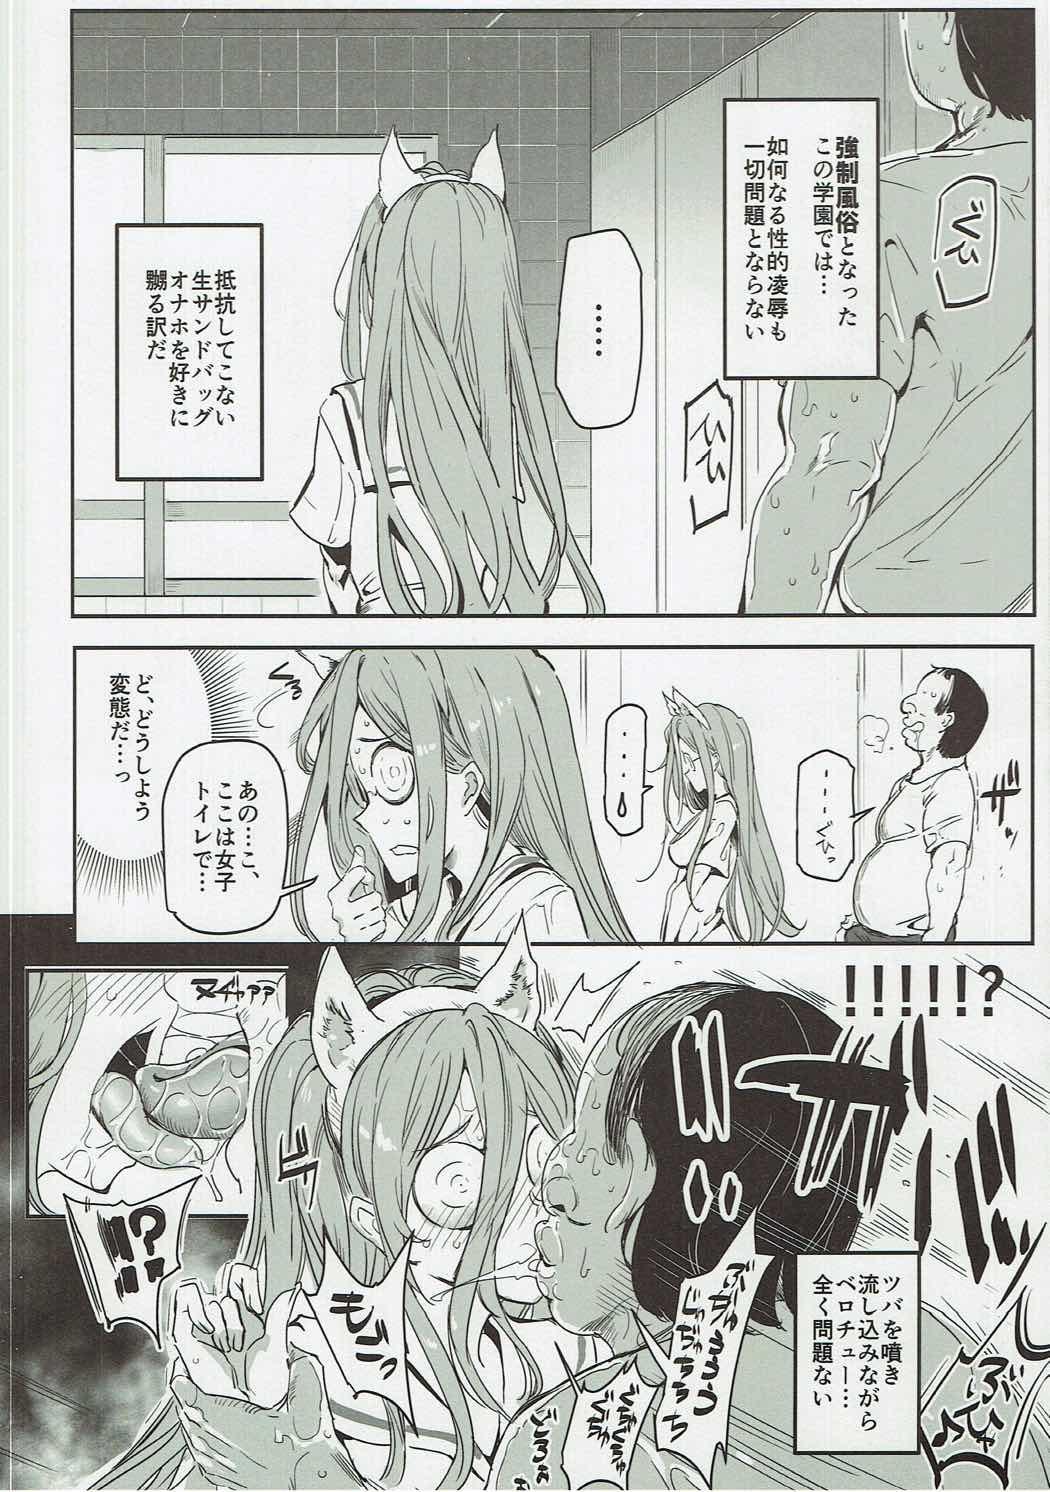 Girls & Kyousei Panpan 8